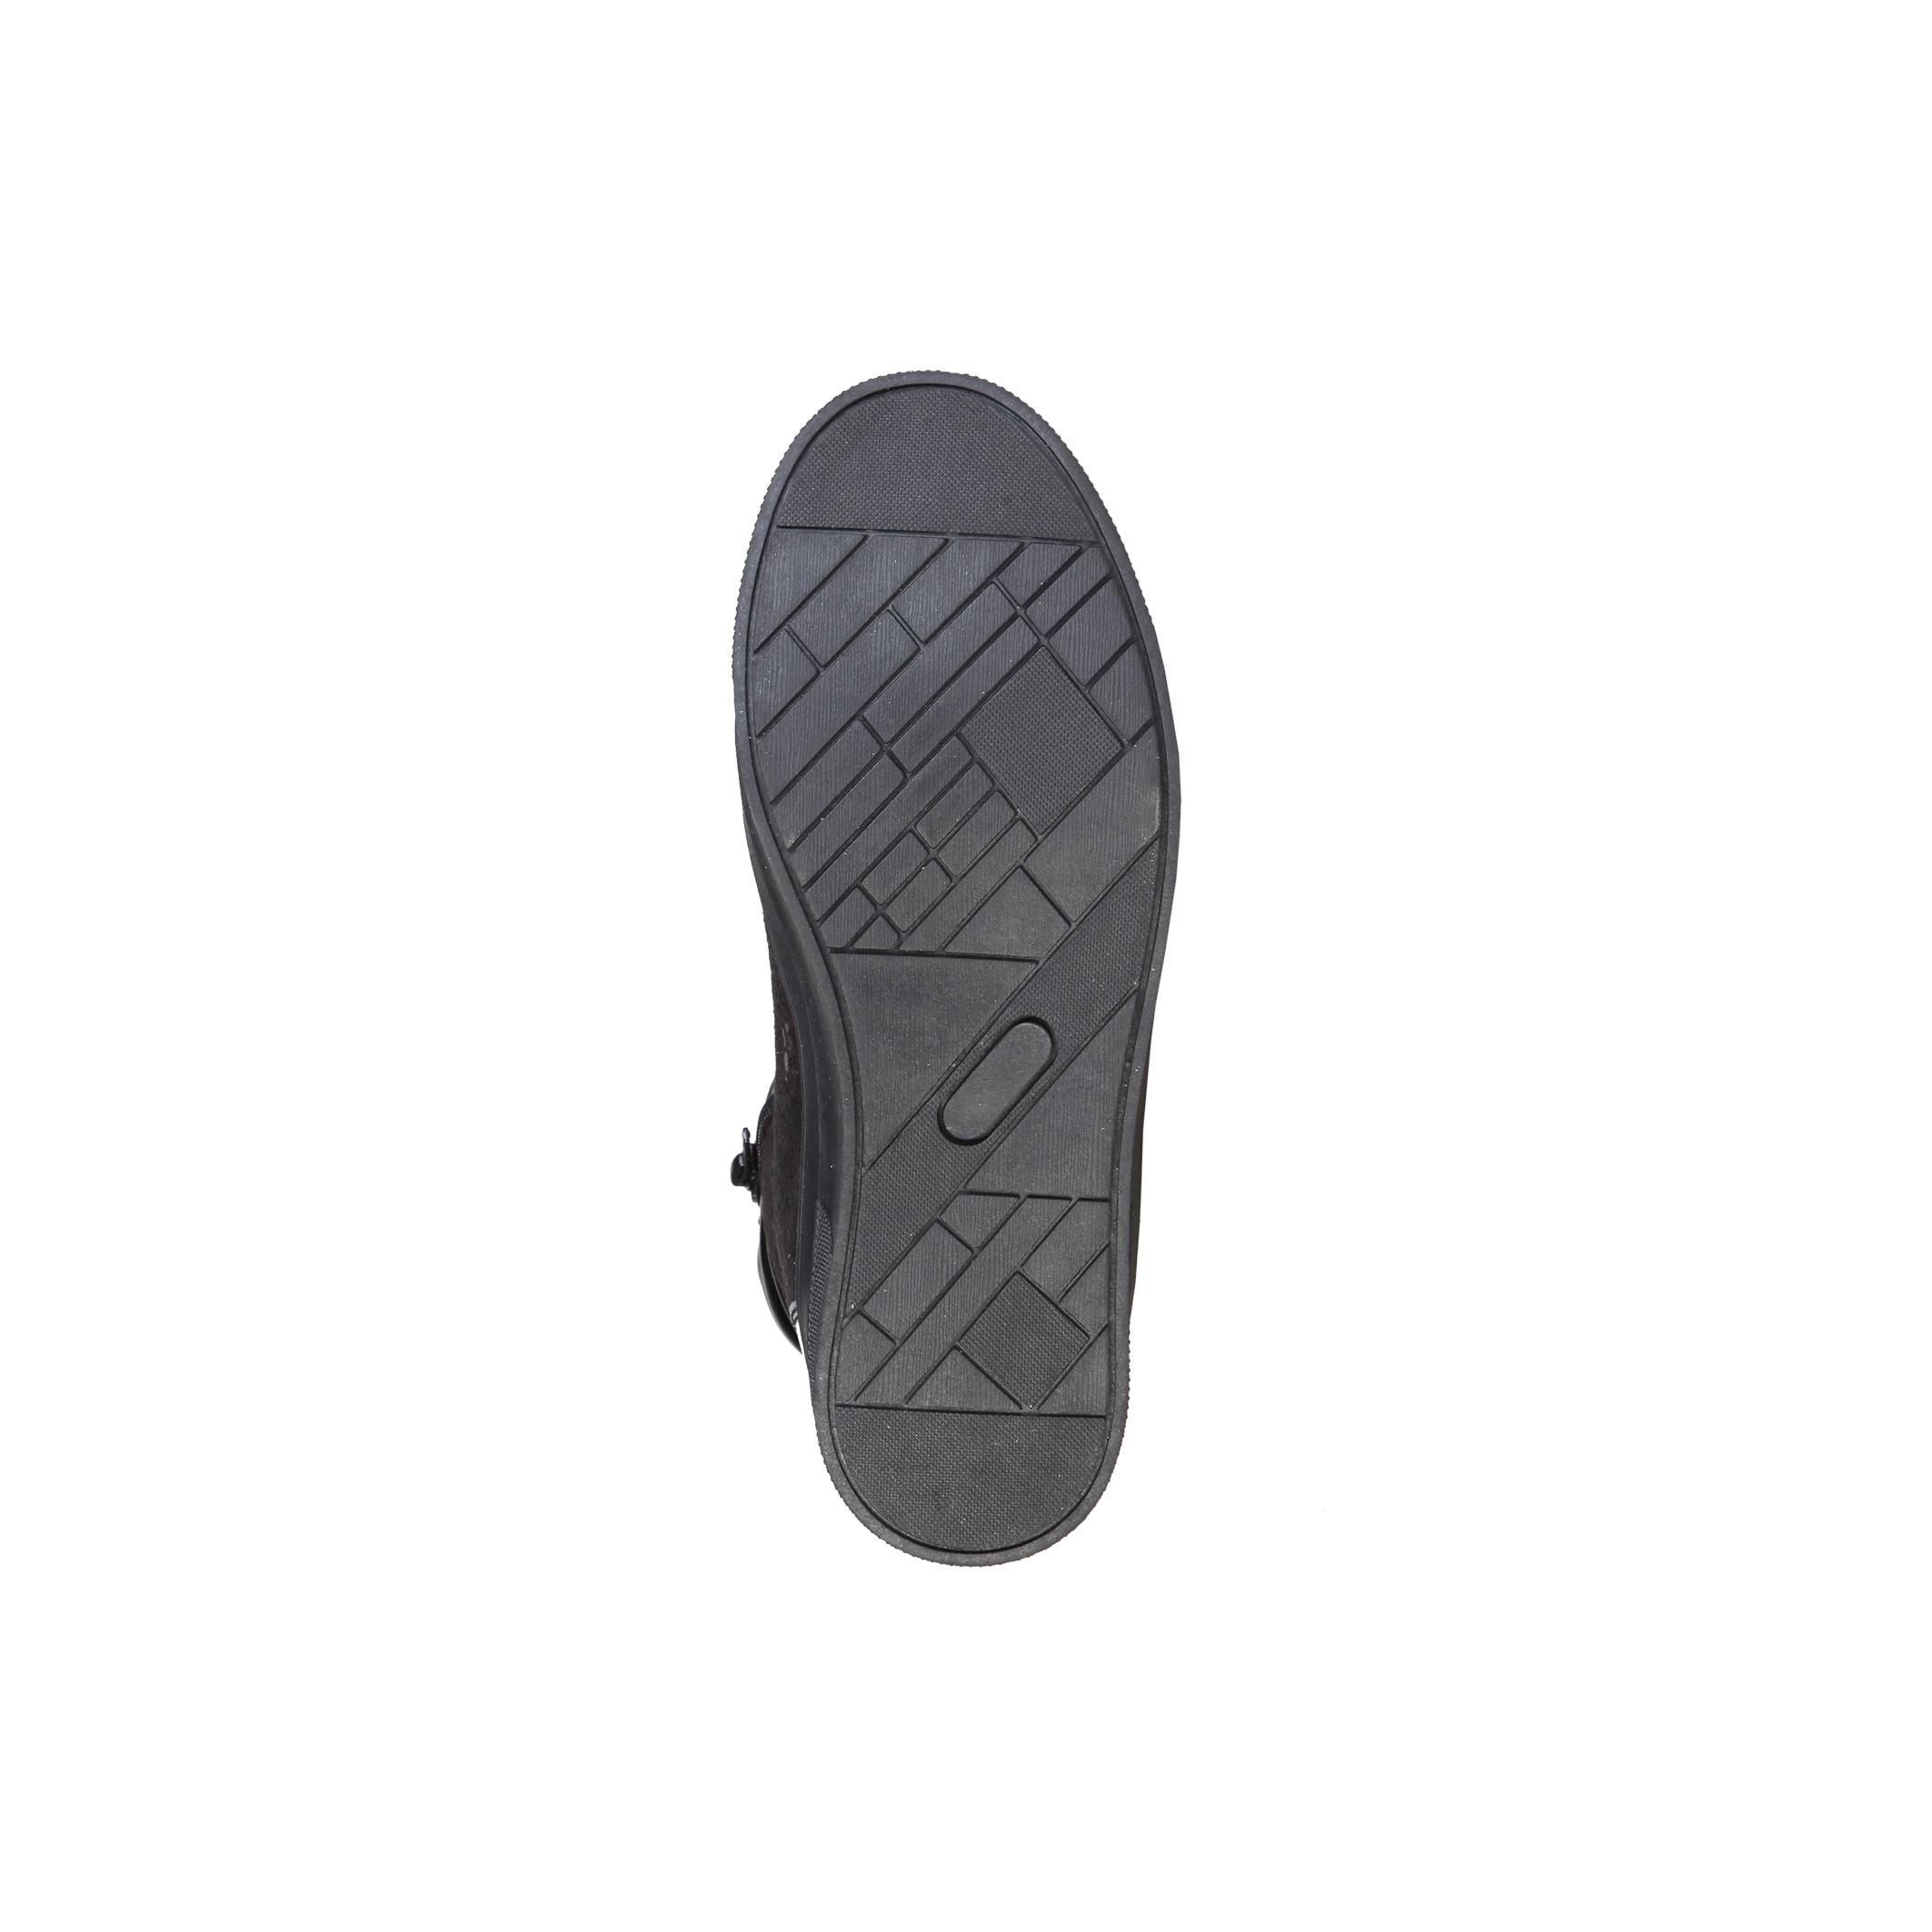 Baskets / Sneakers  Laura Biagiotti 2042 black